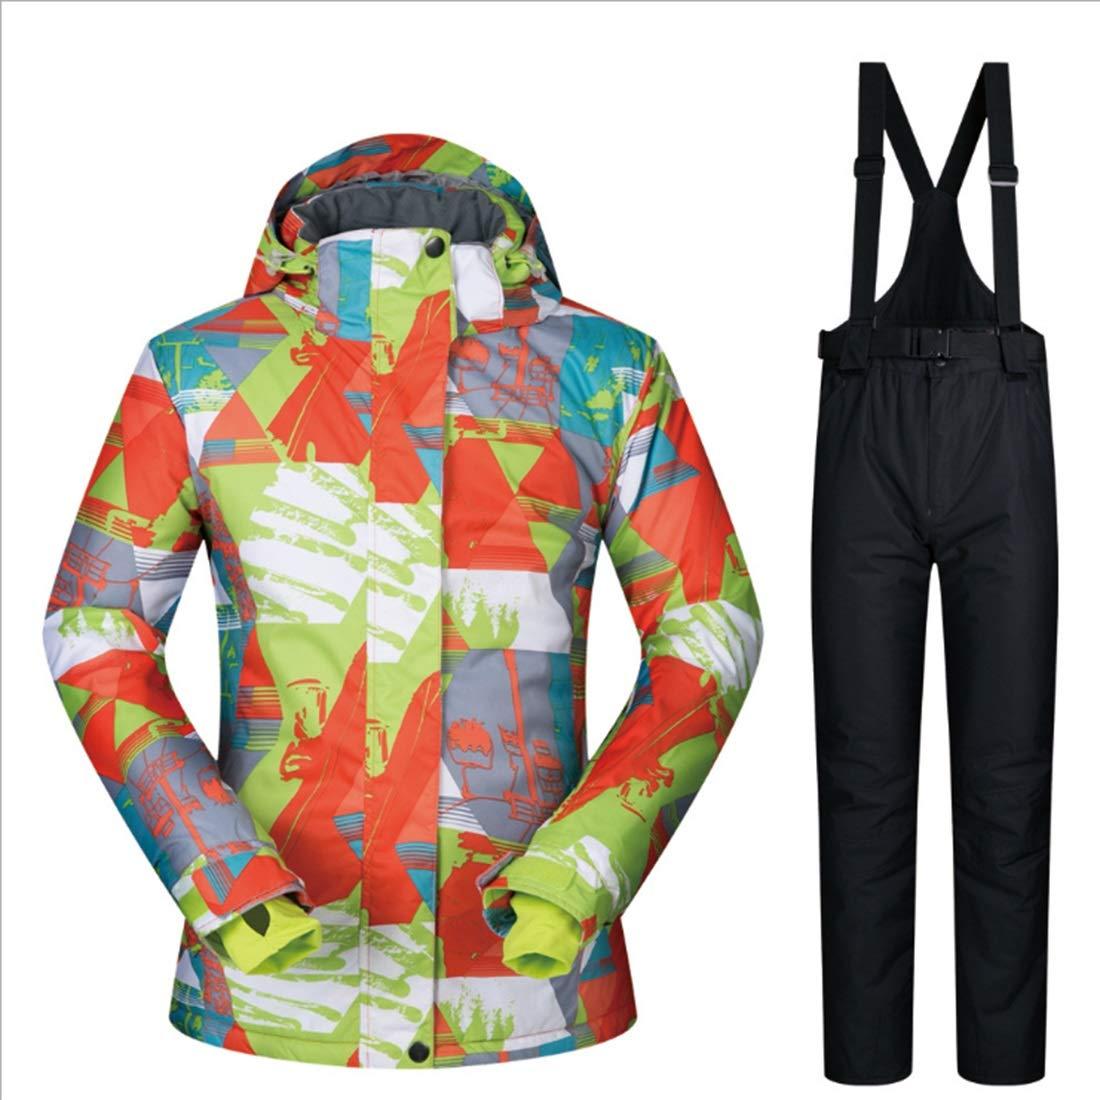 6 XIAMEND Winter Women's Waterproof Ski Jacket, Rain Snow Outdoor Hiking Coat (color   04, Size   M)